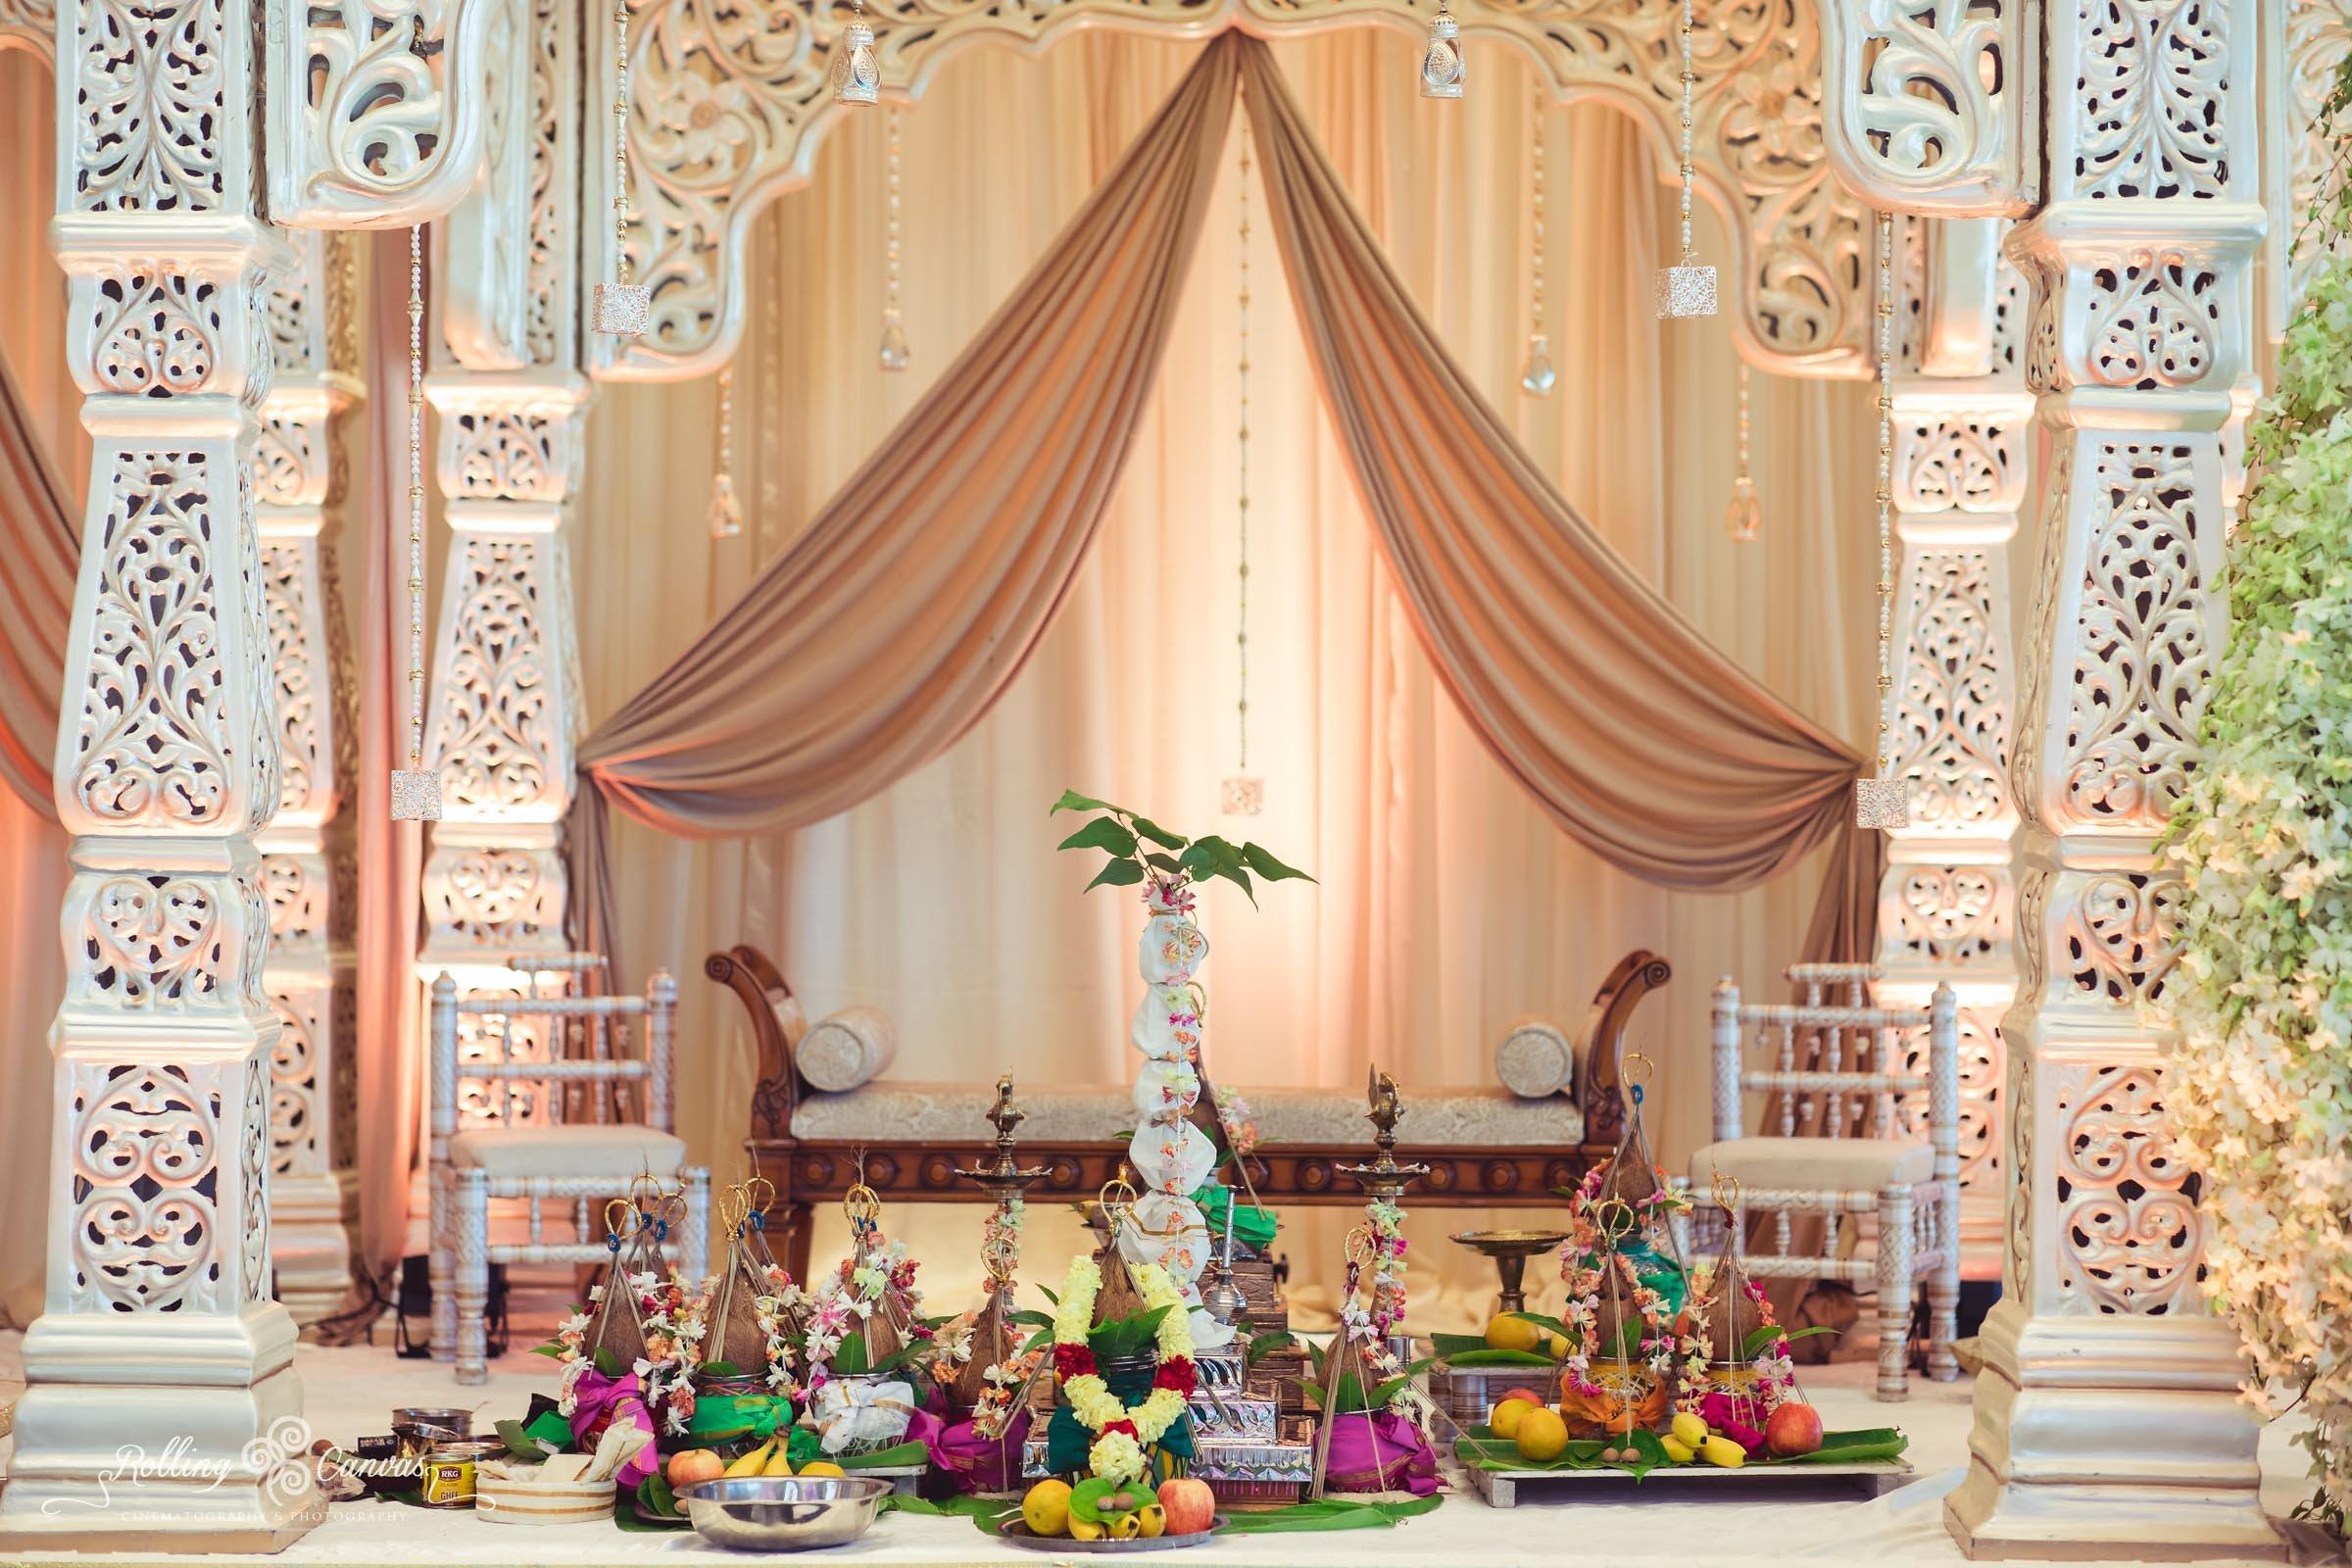 Wedding_Photography_Sydney_Rolling_Canvas_Presentation_Hindu_Ceremony_Mandap_Hyatt_Regency_Floral_Design-57067.jpg